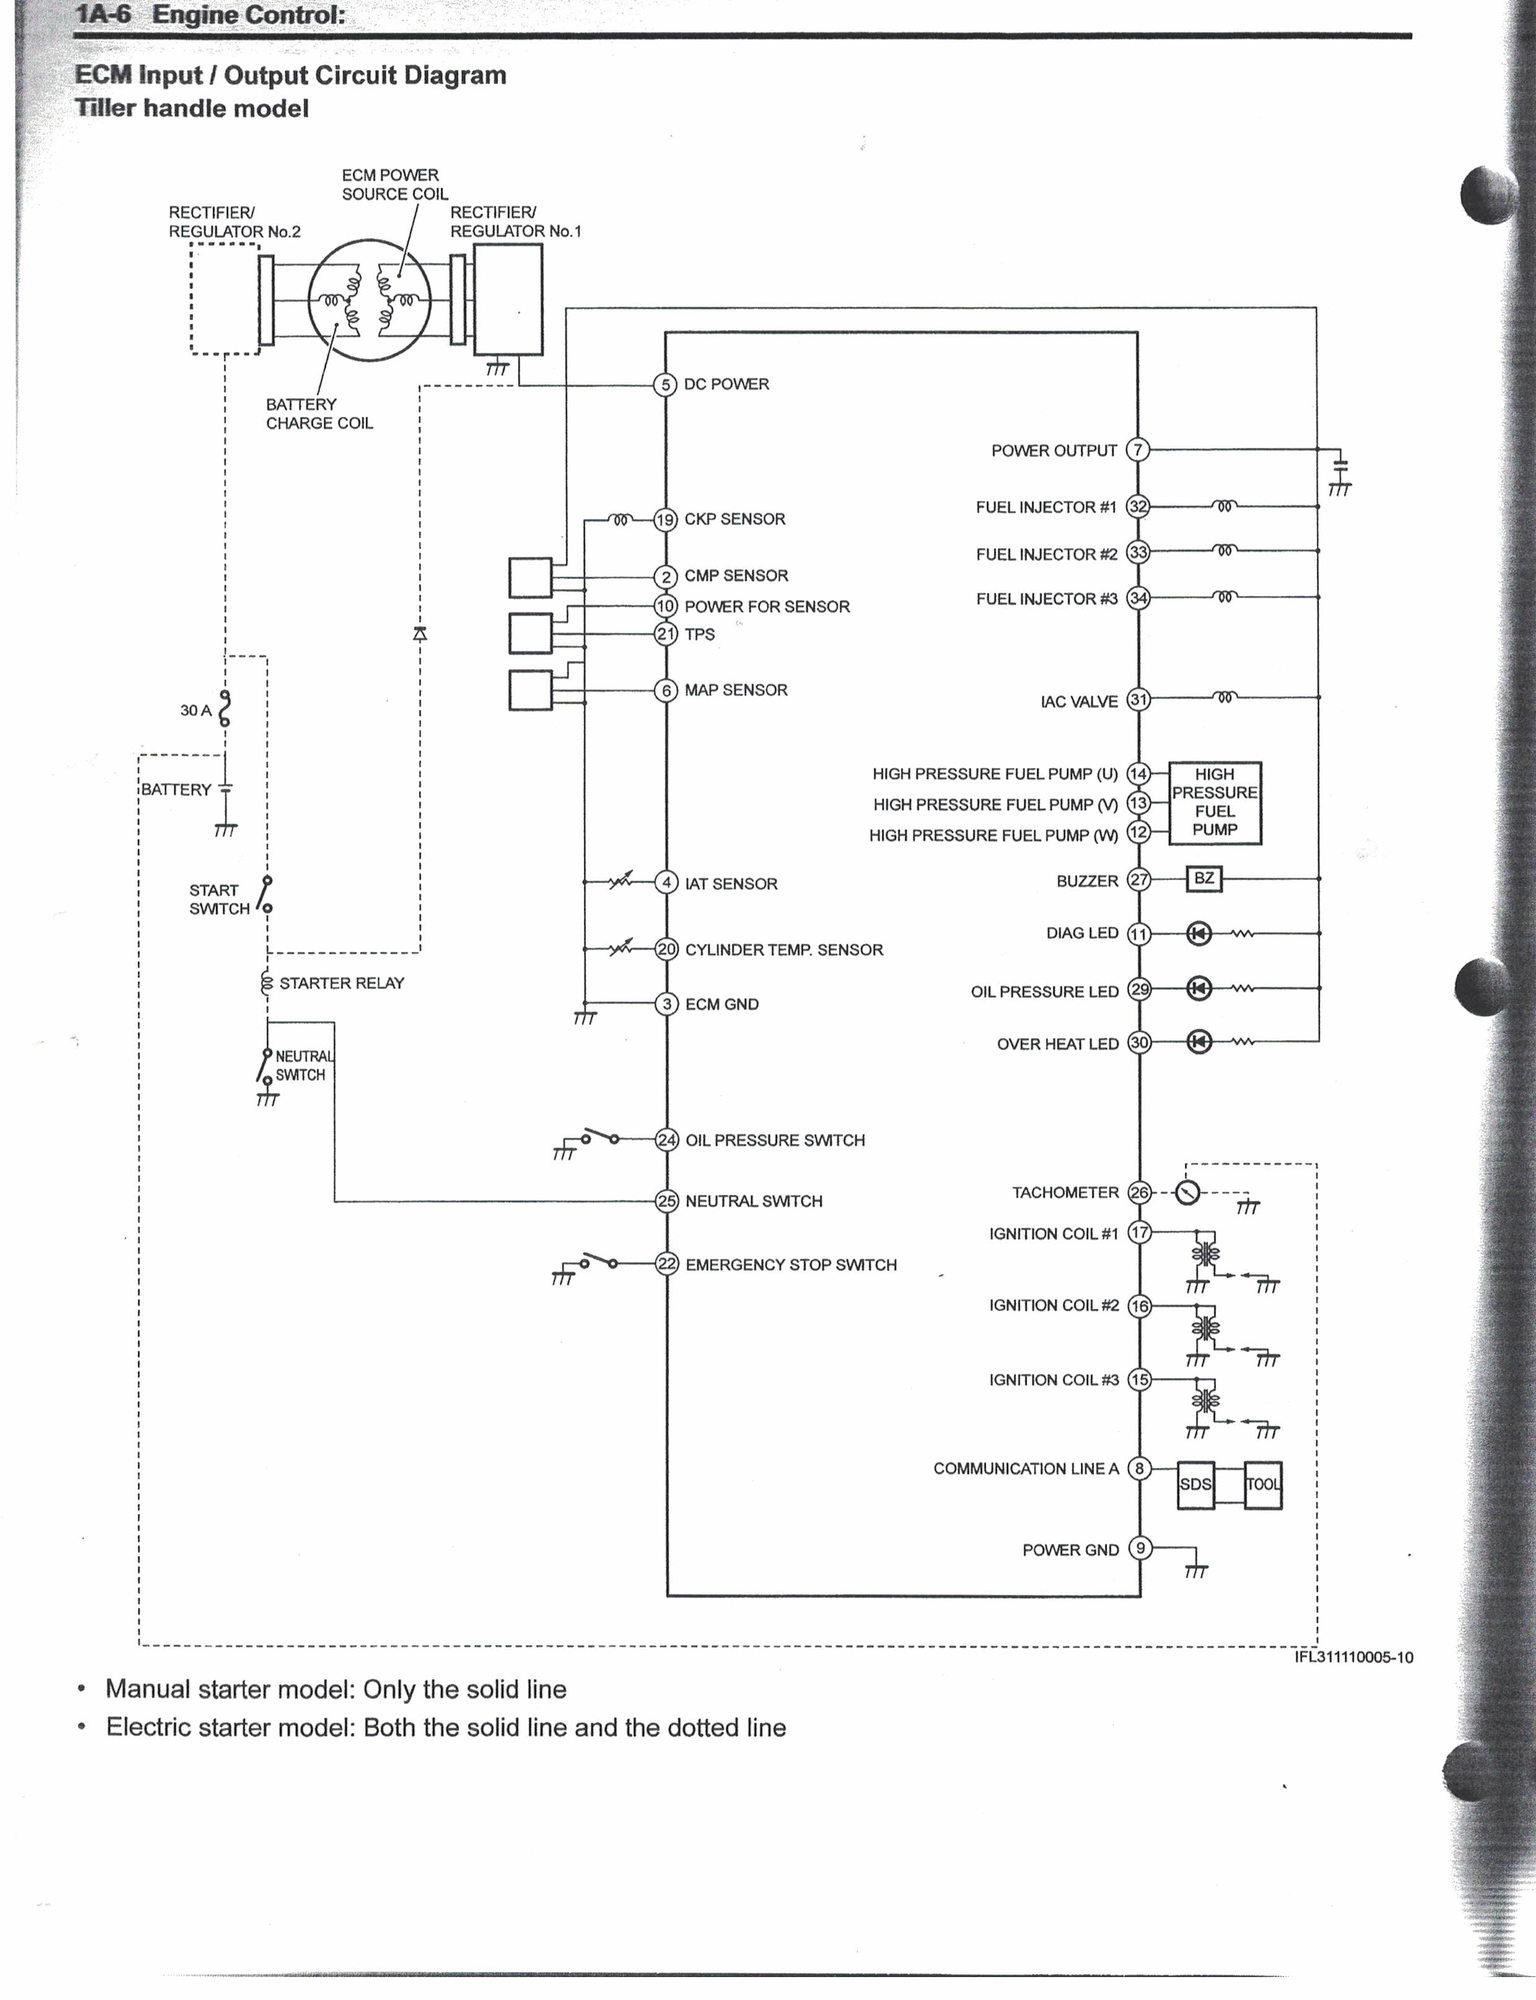 Suzuki Outboard Tachometer Wiring from cimg9.ibsrv.net